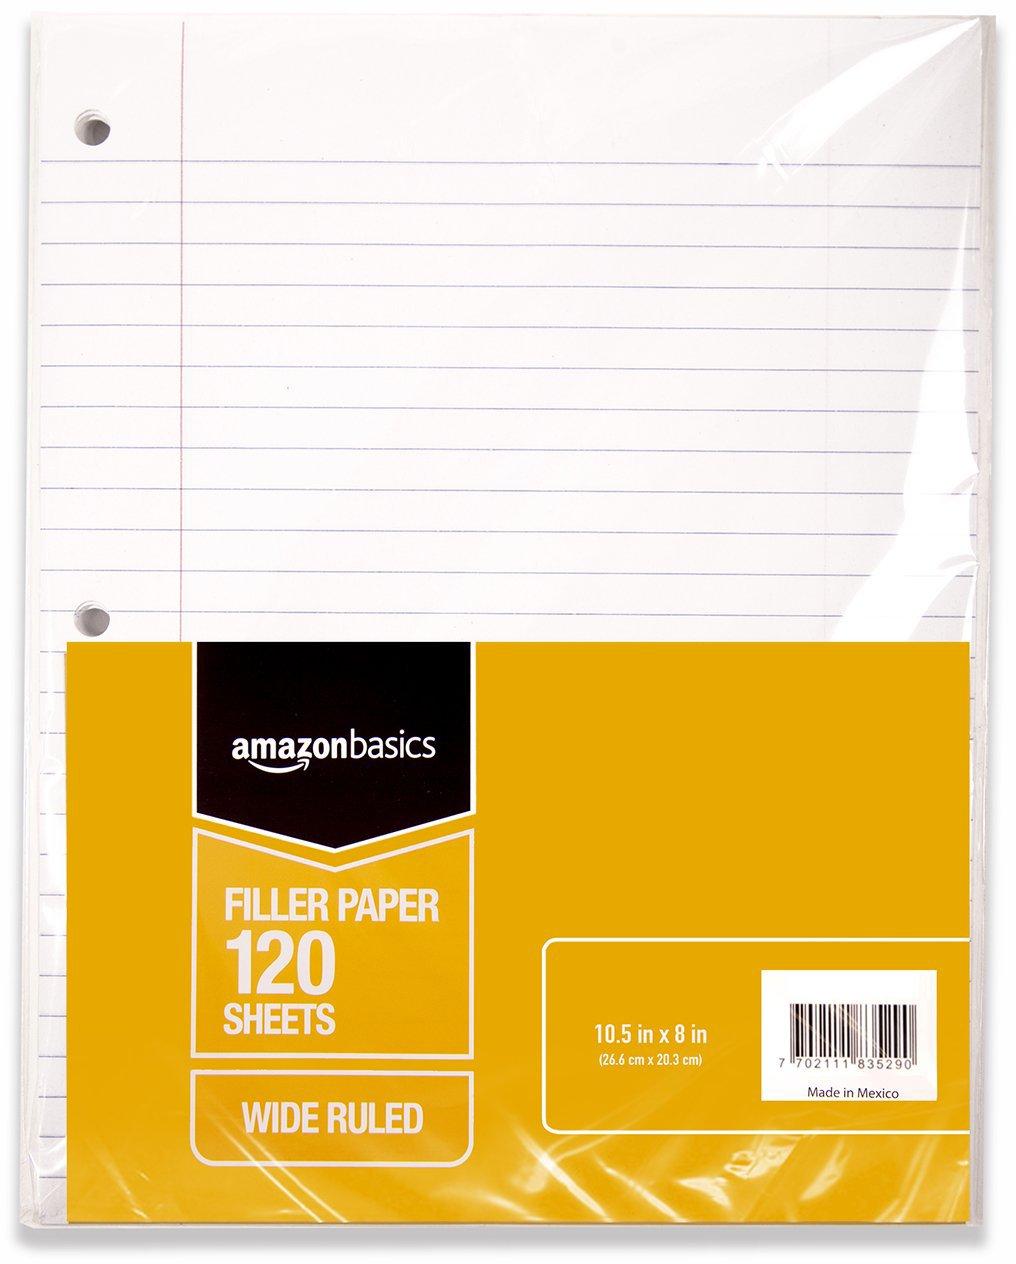 "AmazonBasics Wide Ruled Loose Leaf Filler Paper, 120-Sheet, 10.5"" x 8"", 6-Pack 10.5"" x 8"" 583528"